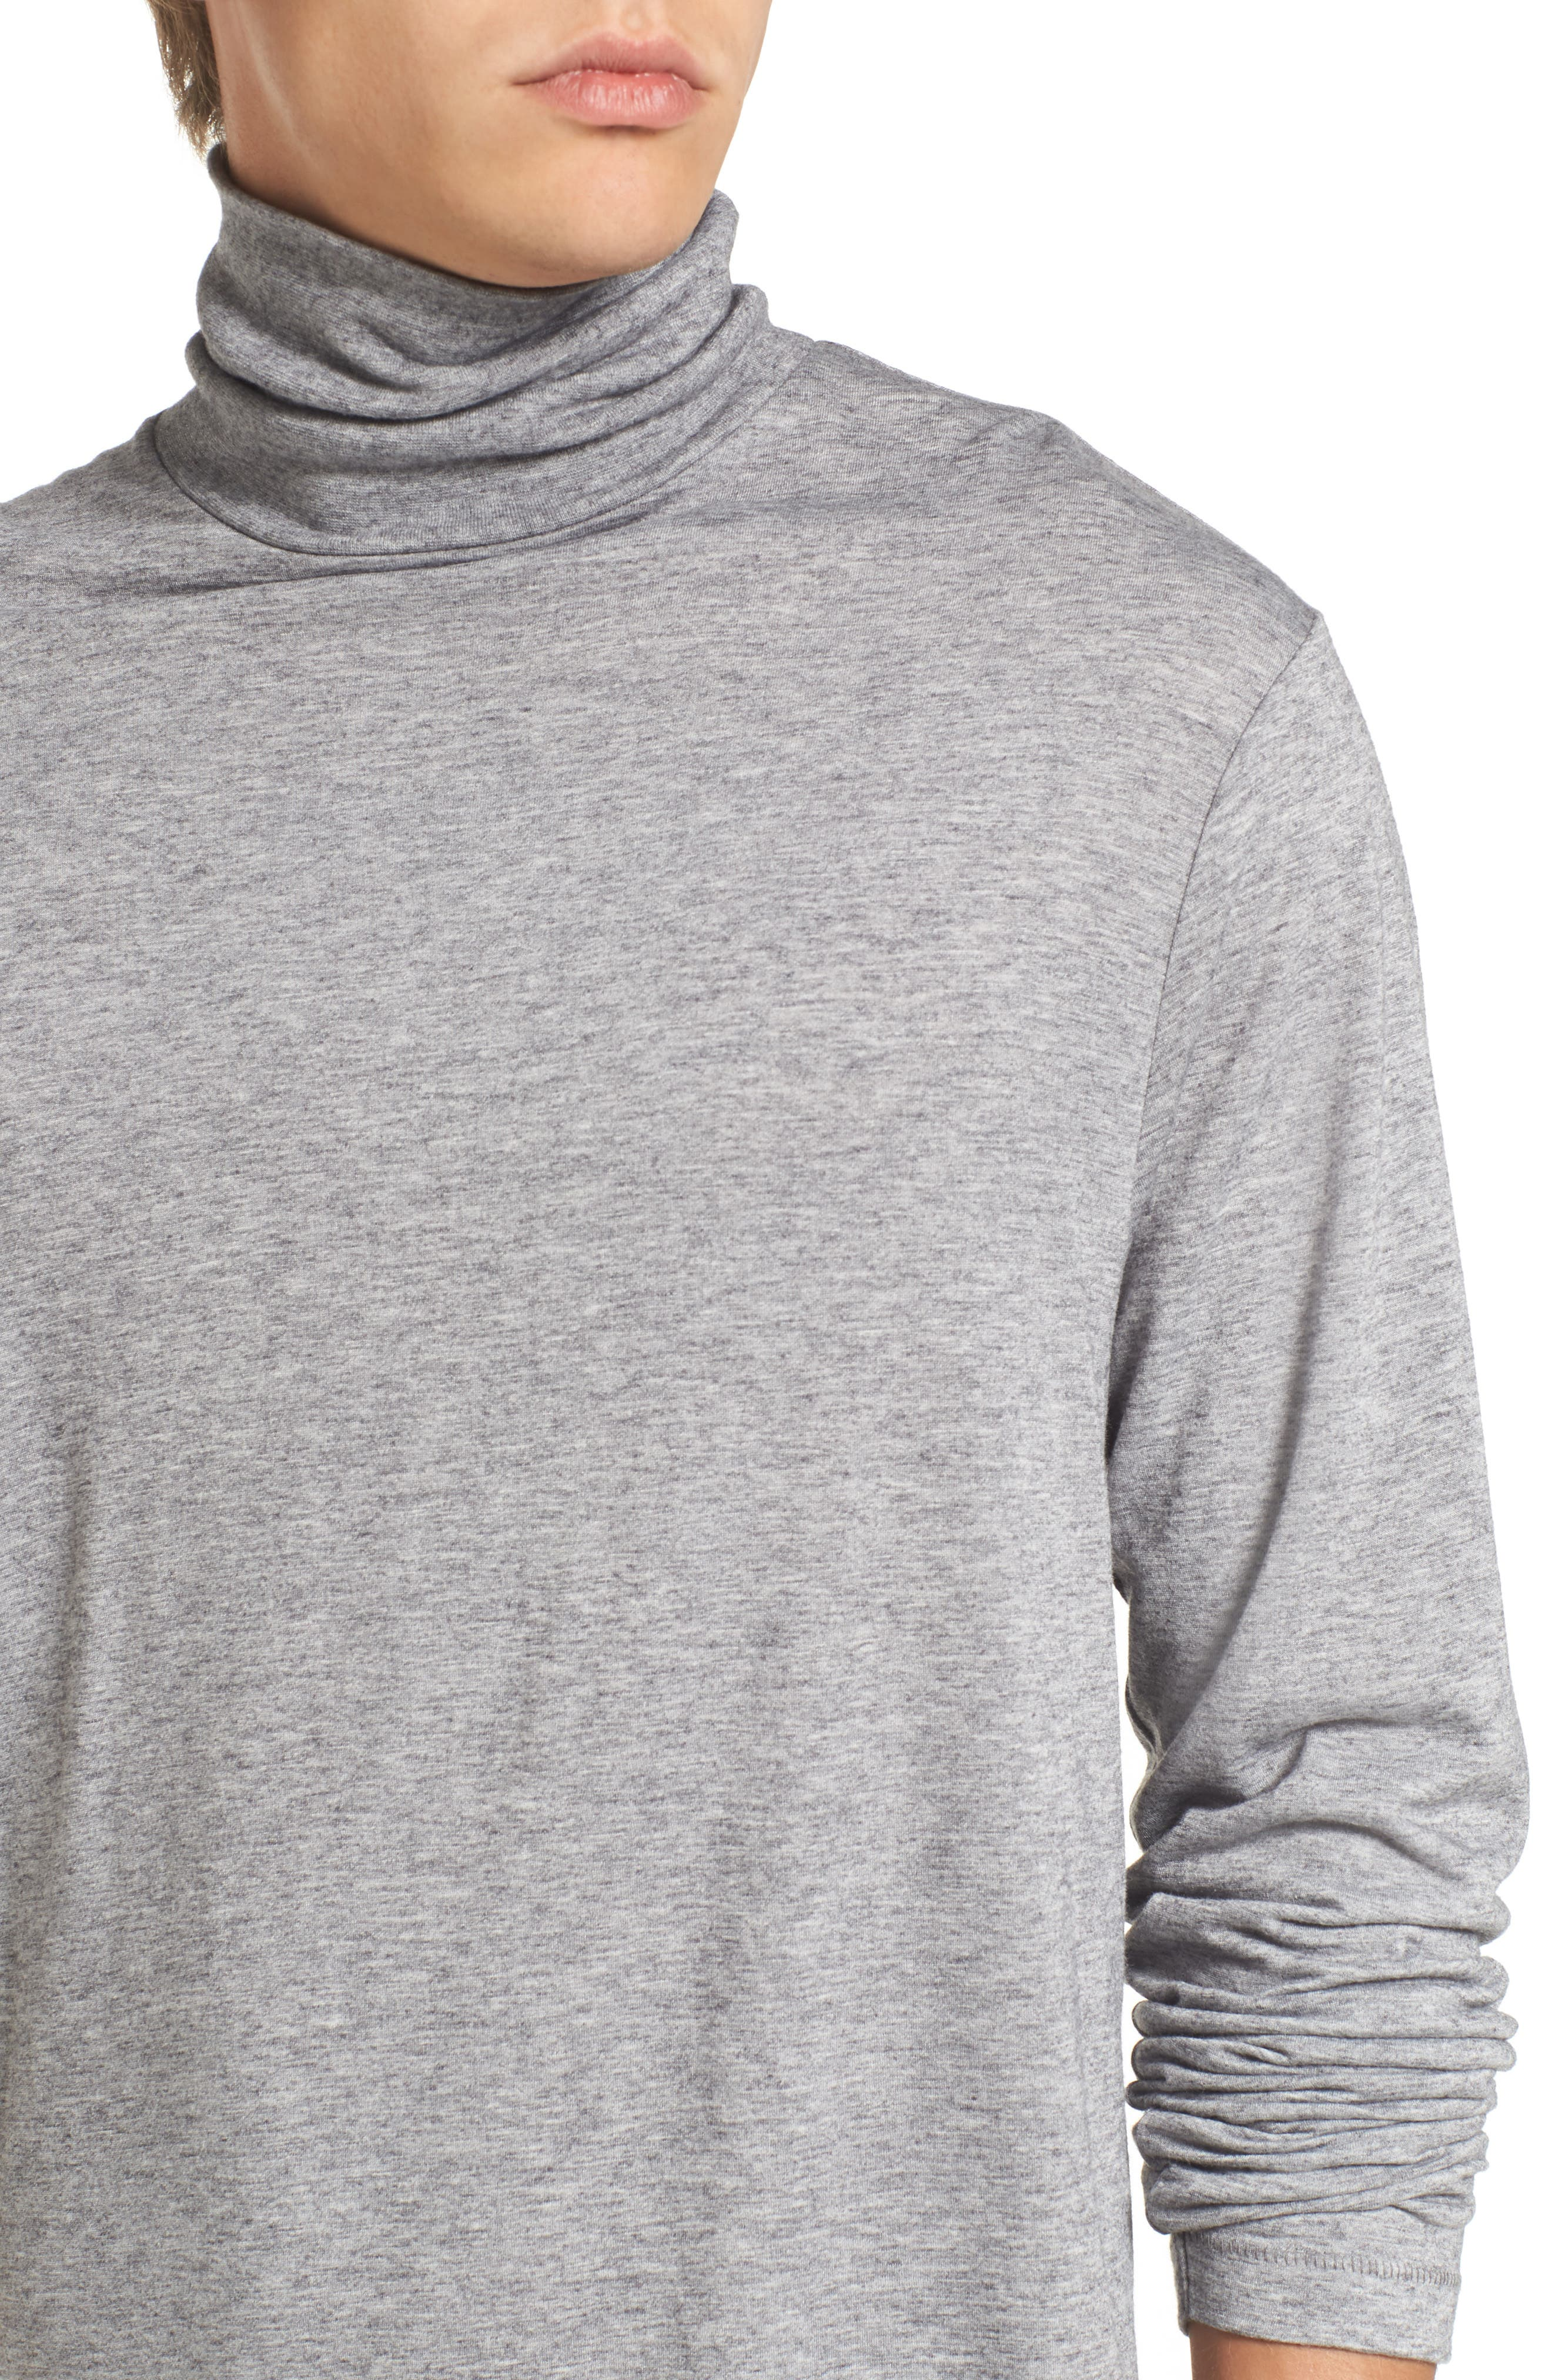 Lightweight Turtleneck Sweater,                             Alternate thumbnail 4, color,                             030